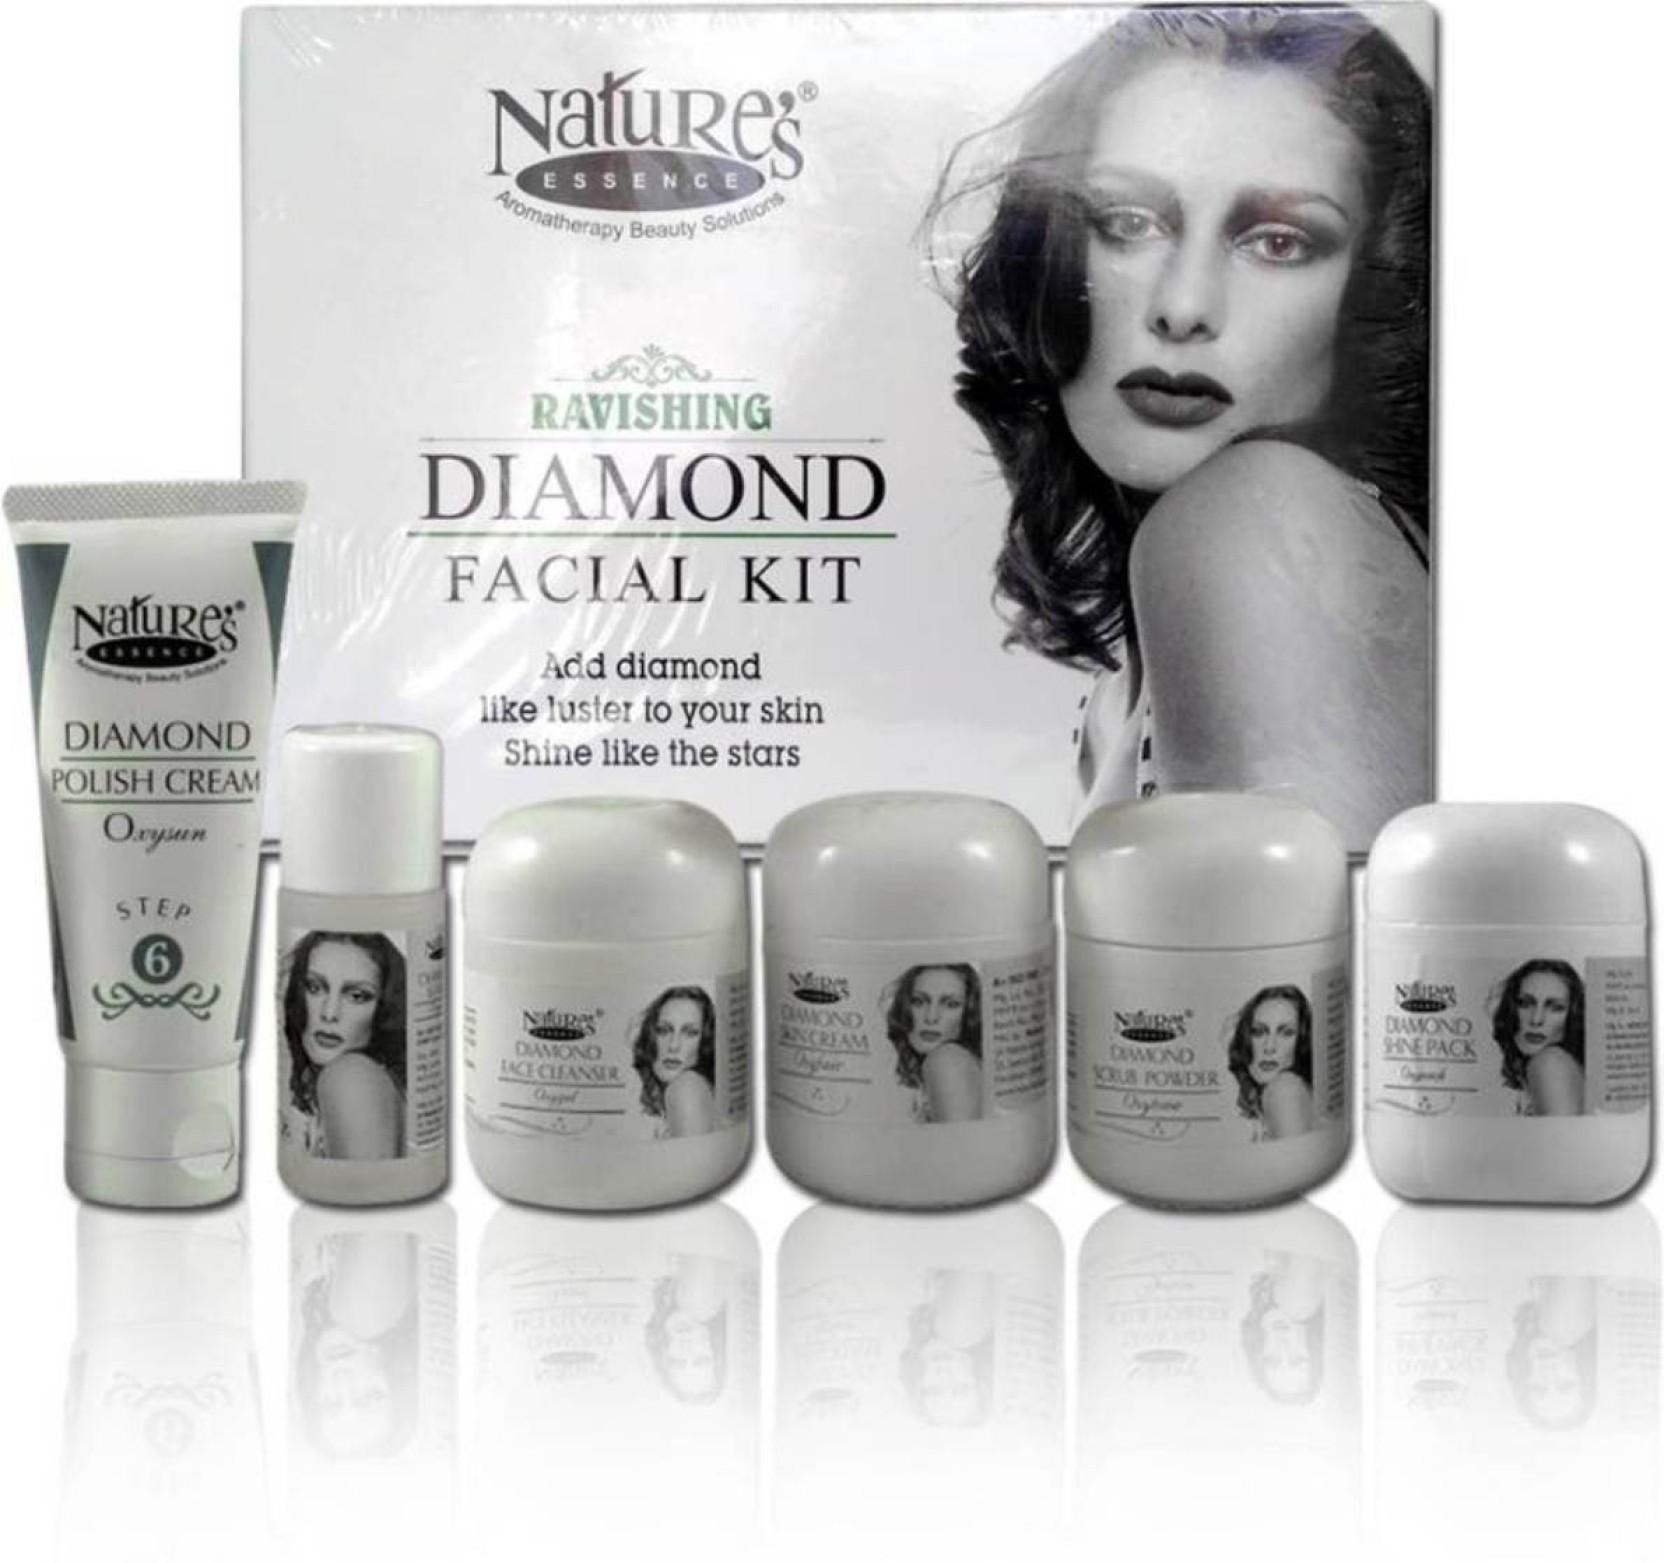 Natures Essence Diamond Facial Kit Medium Pack 250 G Price In Walet Black Soap Original Box Add To Cart